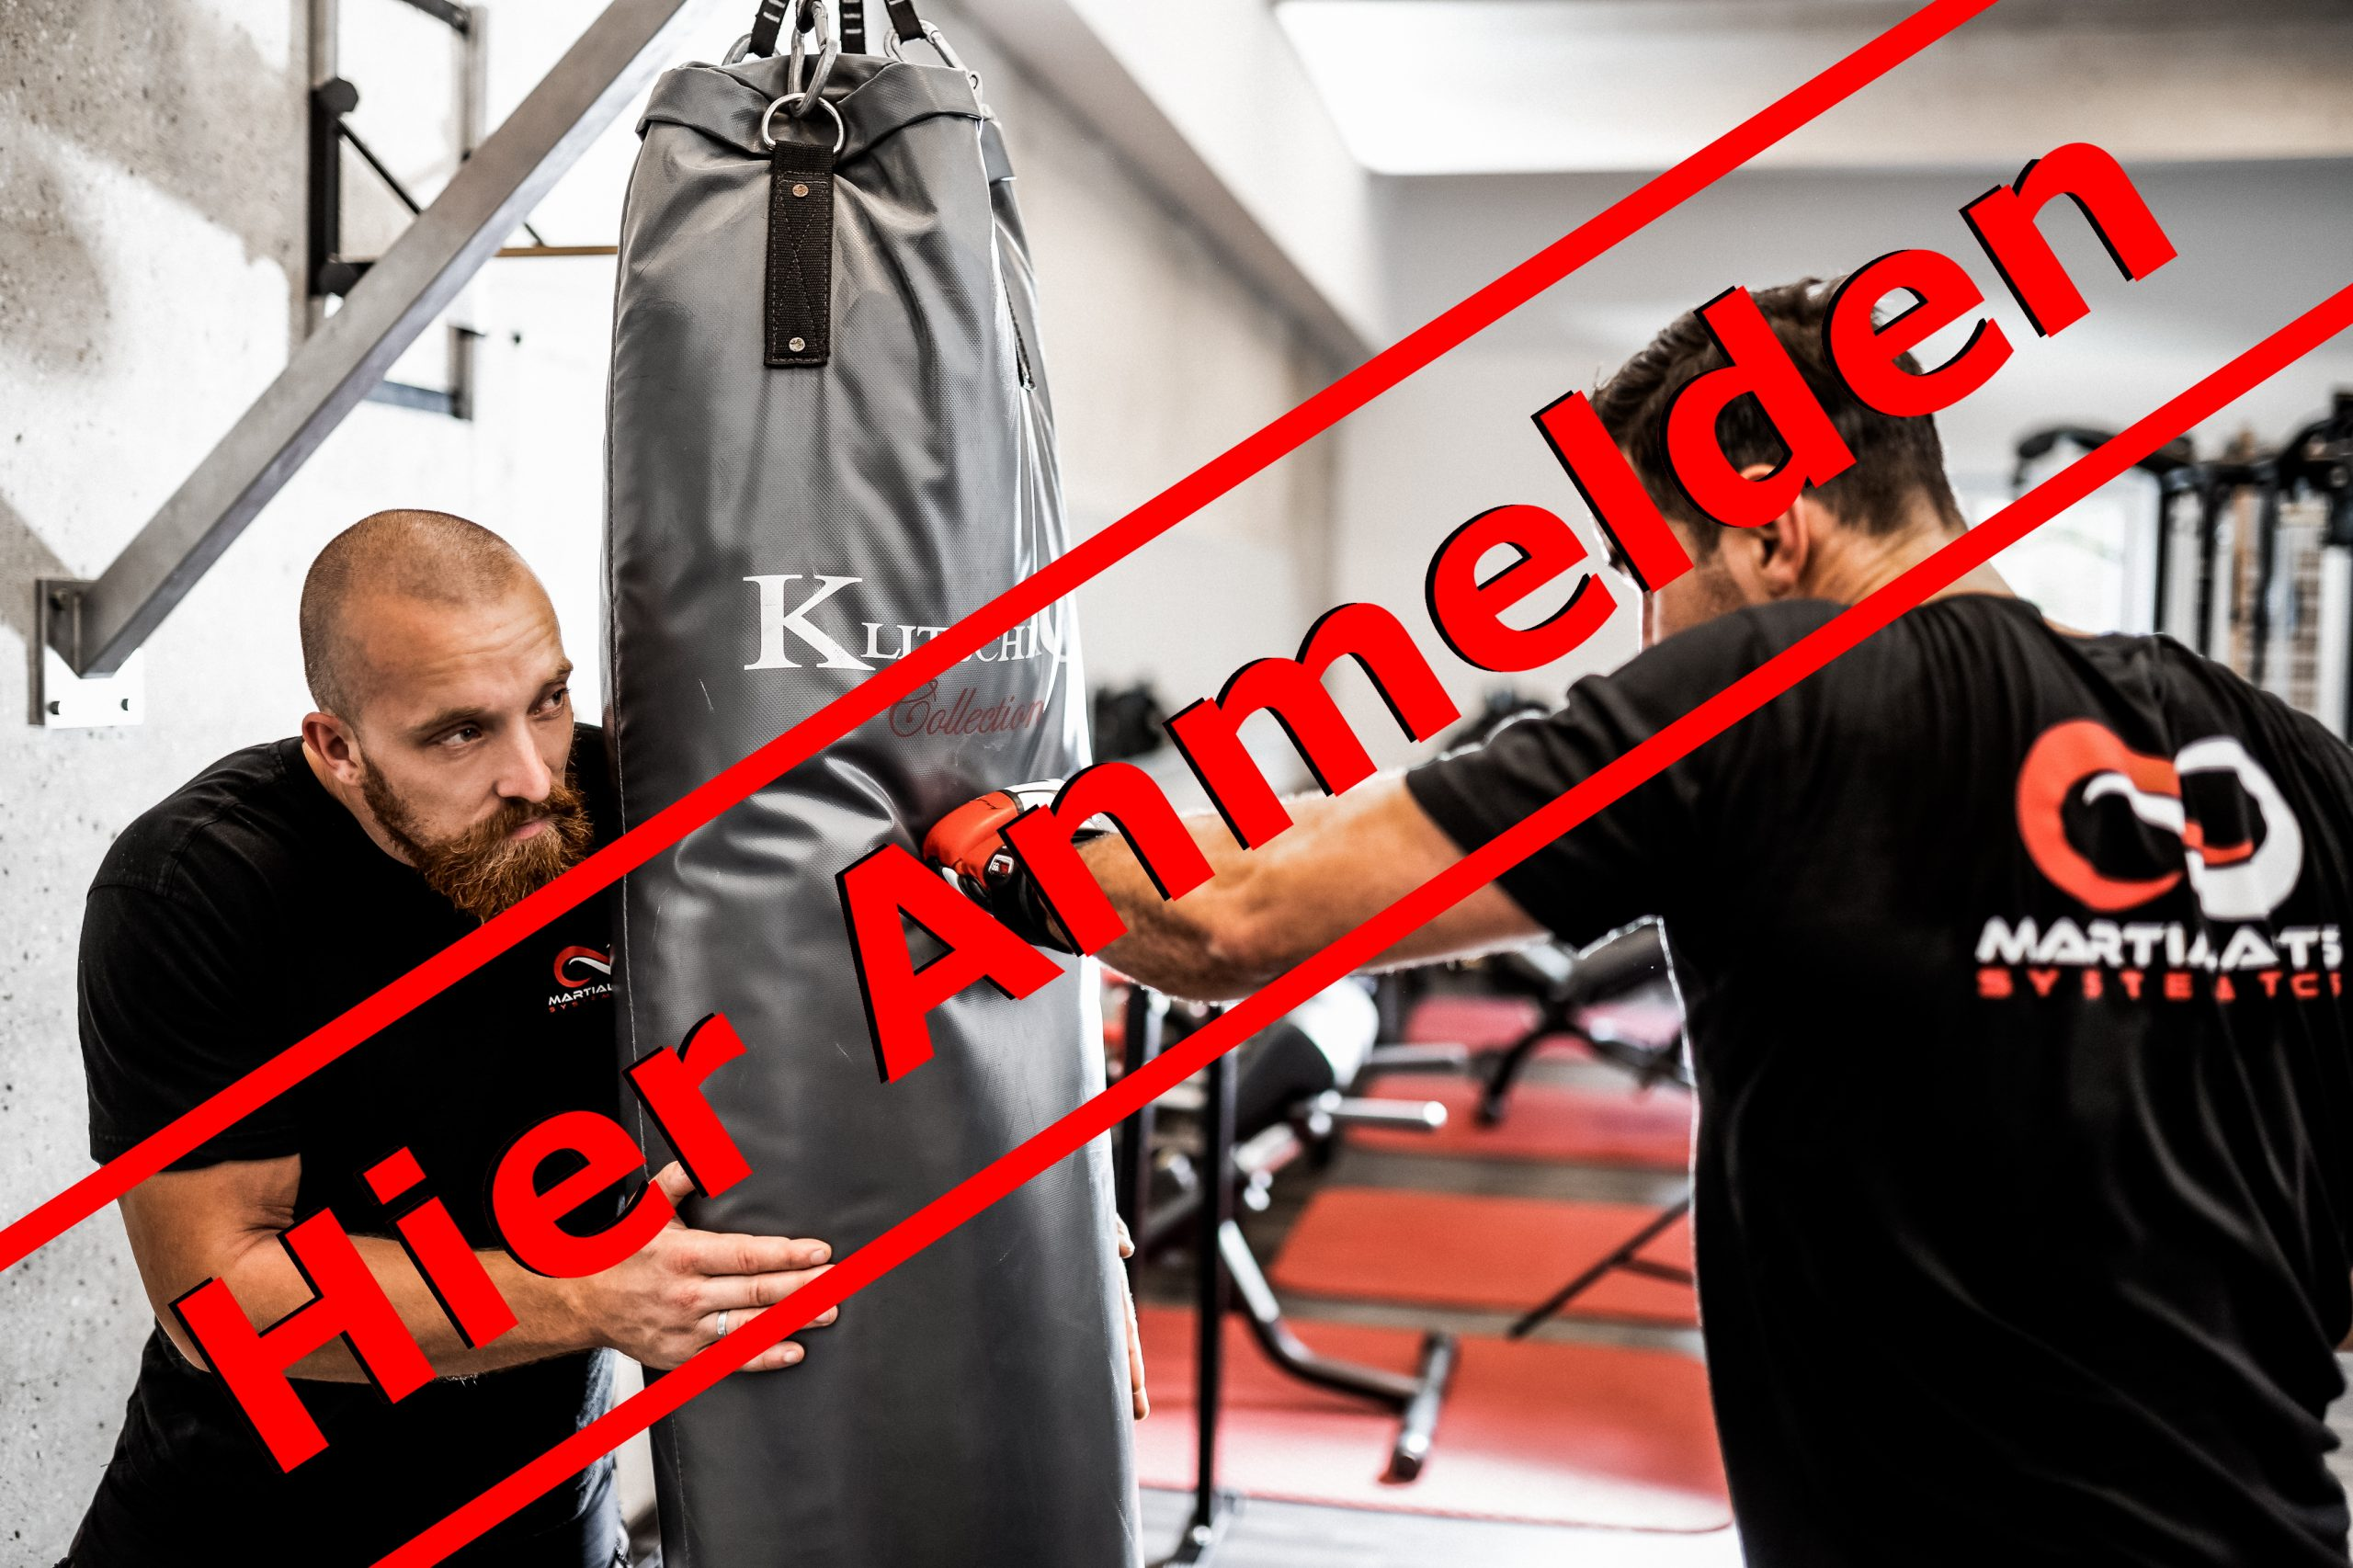 Martial Arts Systematics Anmeldung Probetraining